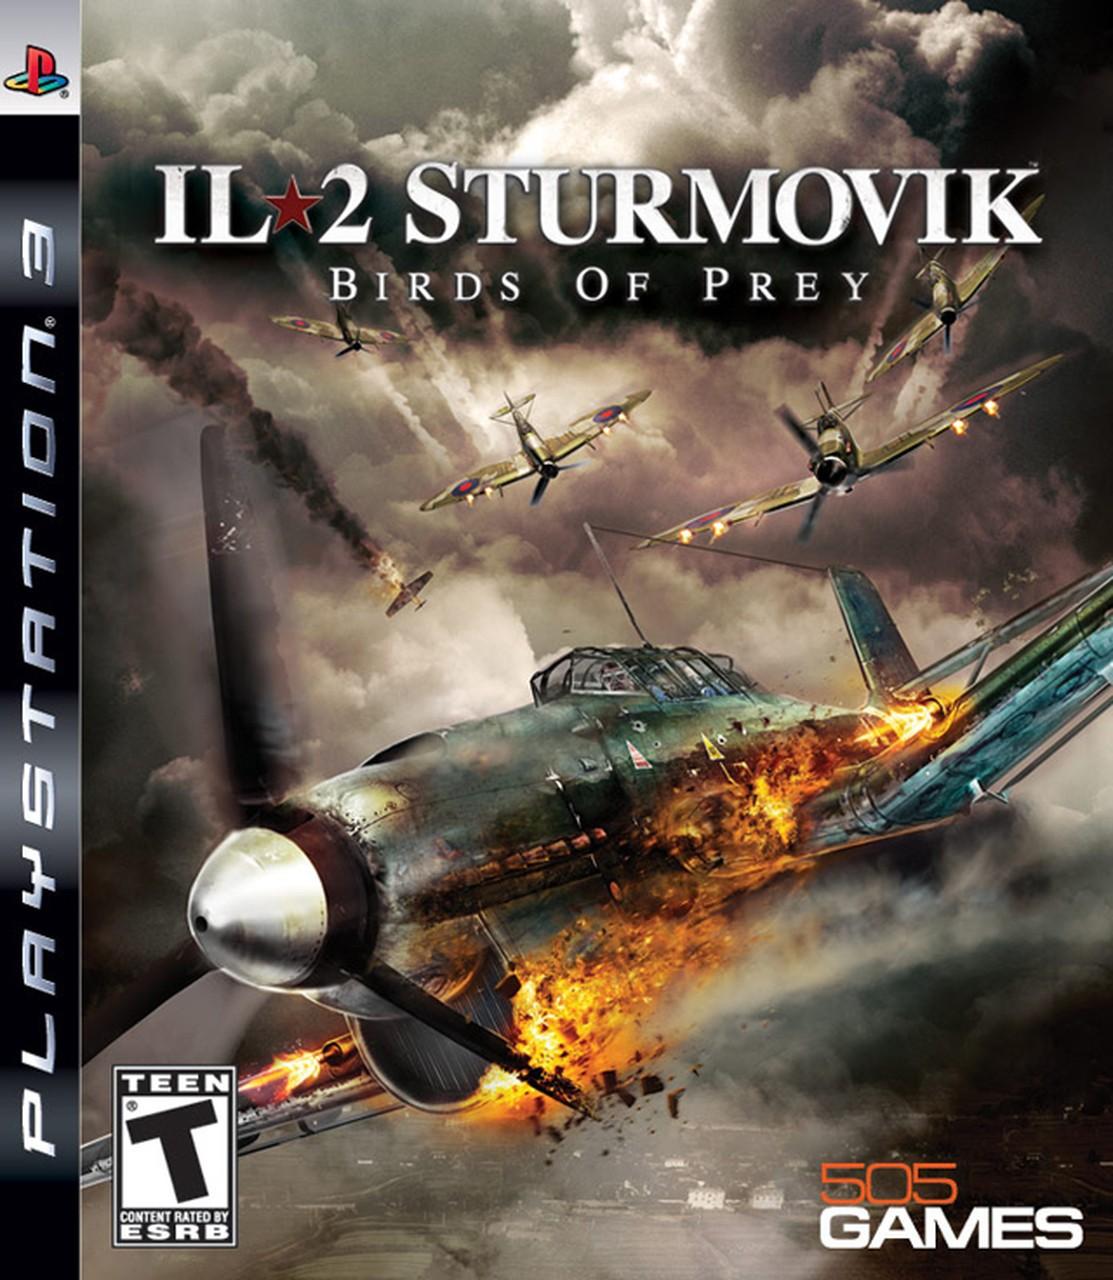 IL-2 Sturmovik Birds of Prey | Ил-2 Штурмовик Крылатые хищники б/в PS3